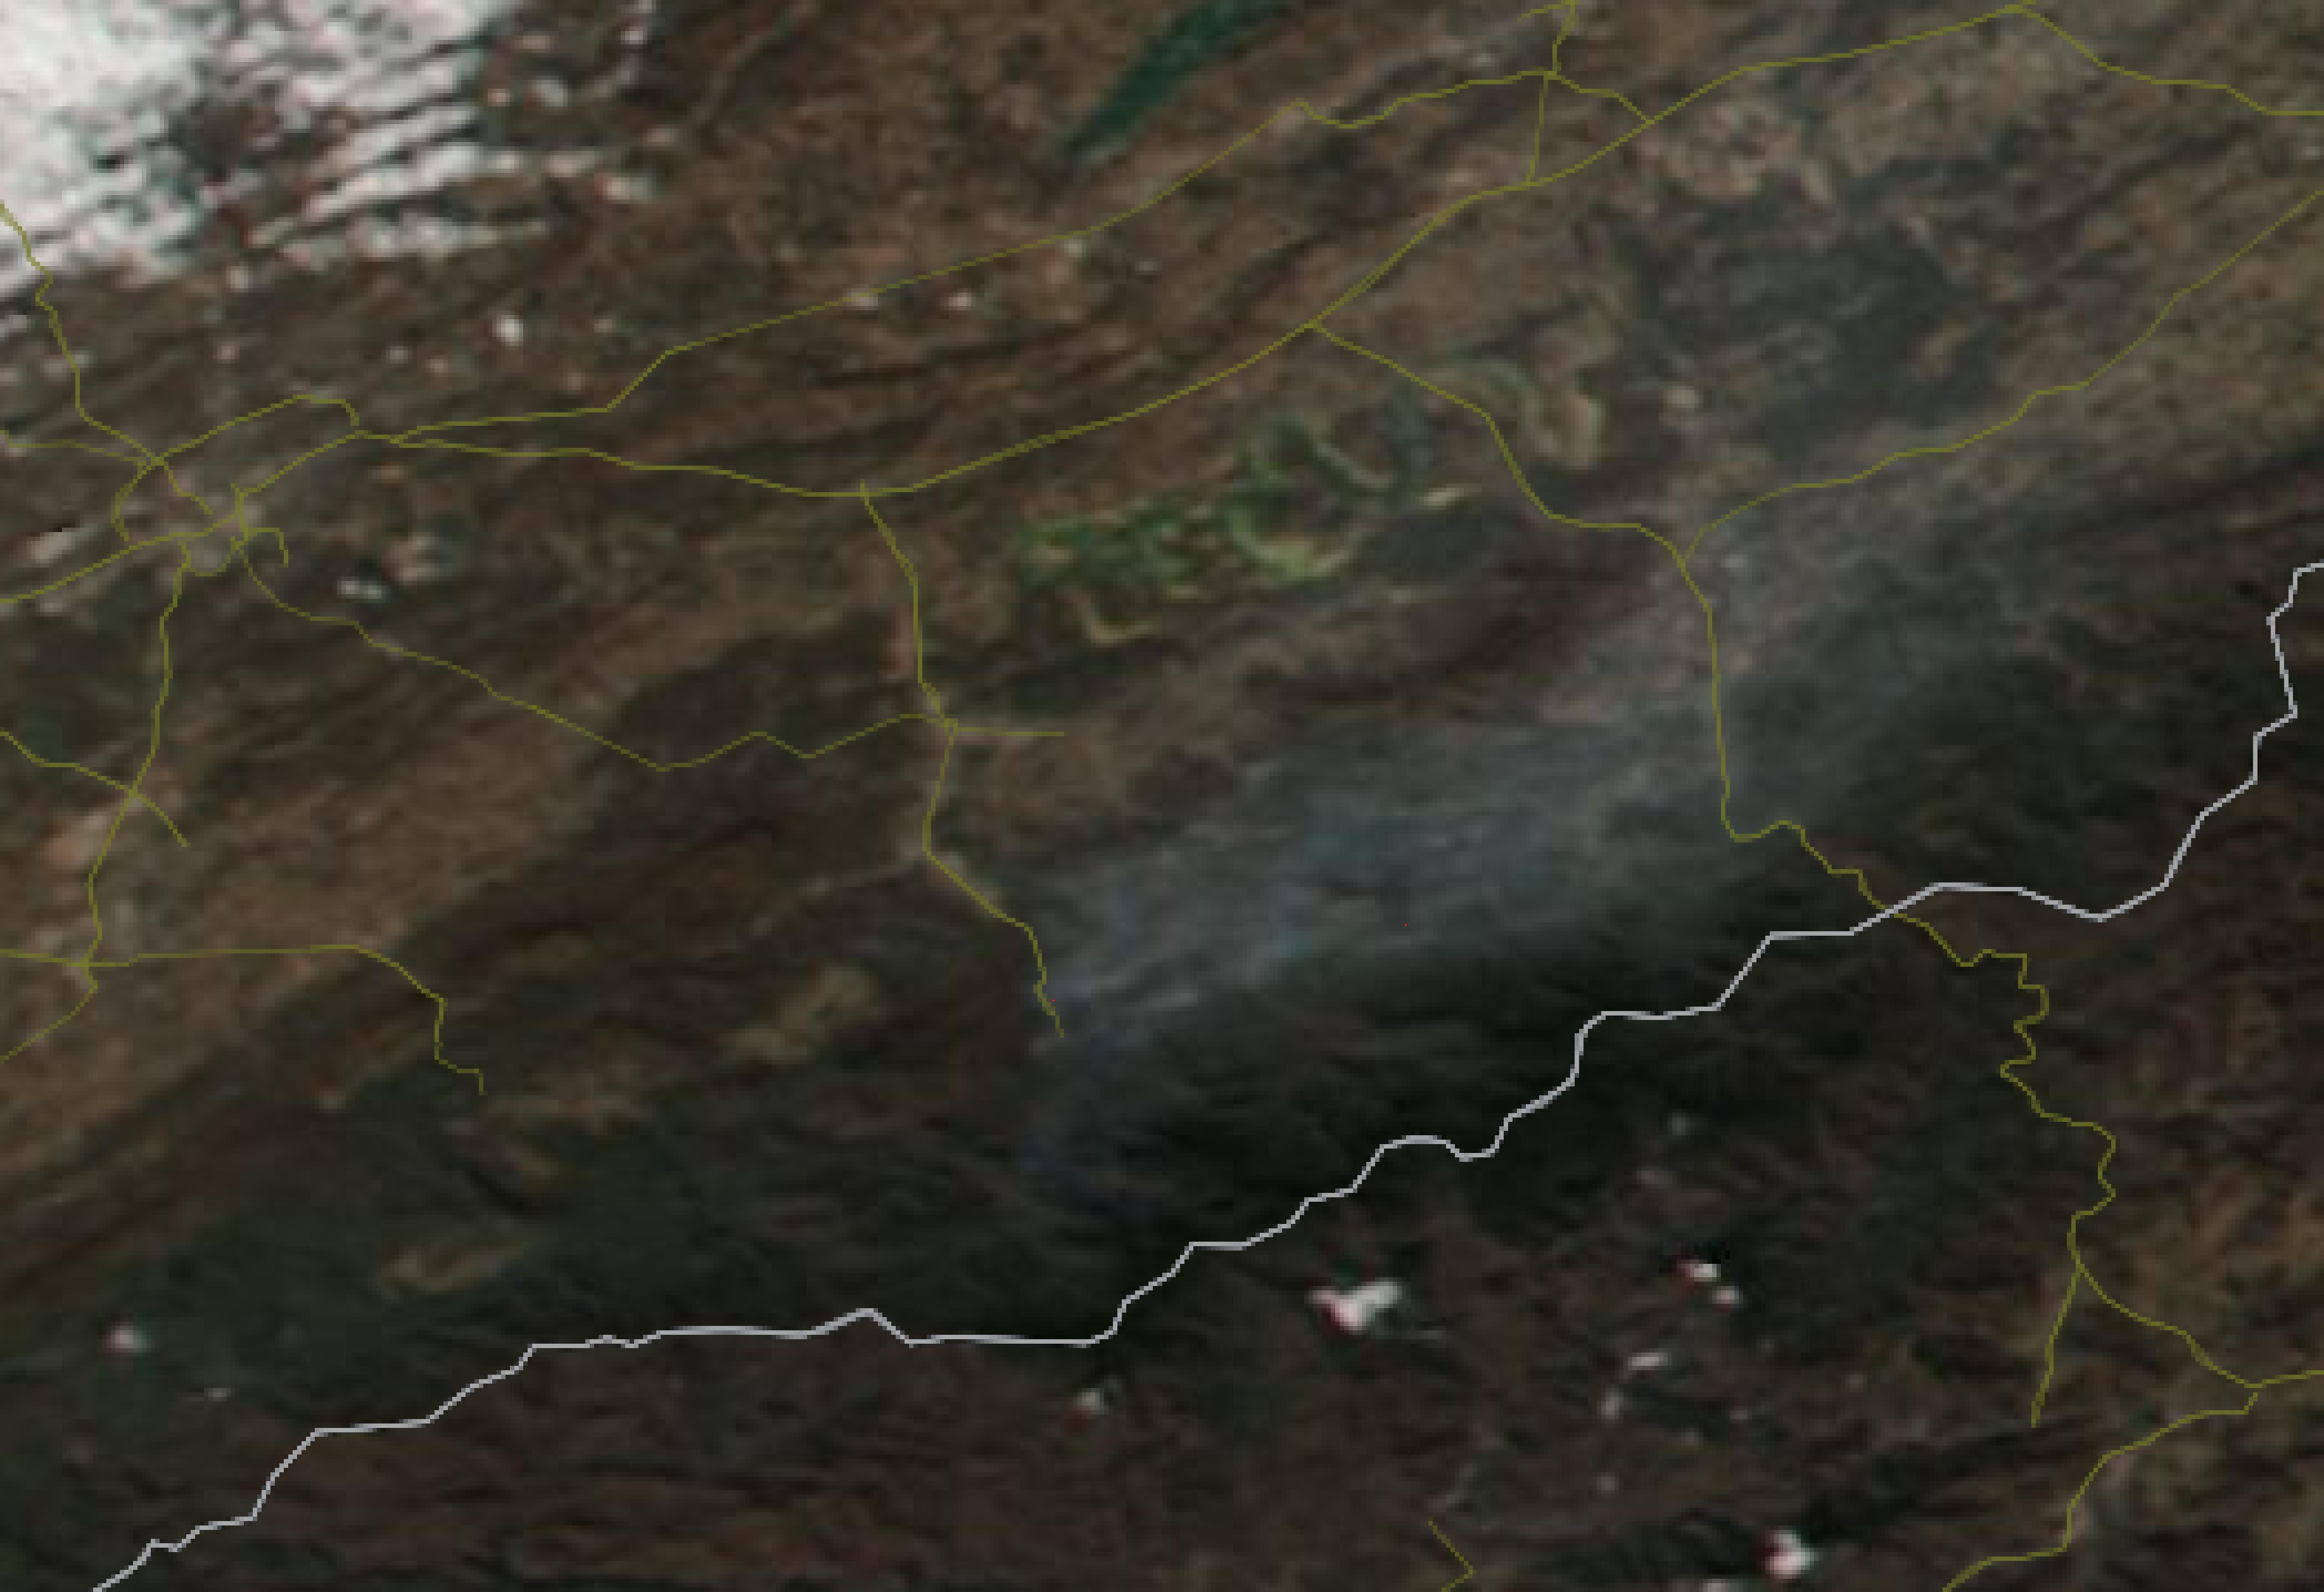 wildfires cross much of southeastern united states nasa image courtesy modis rapid response team caption goddard rob gutro